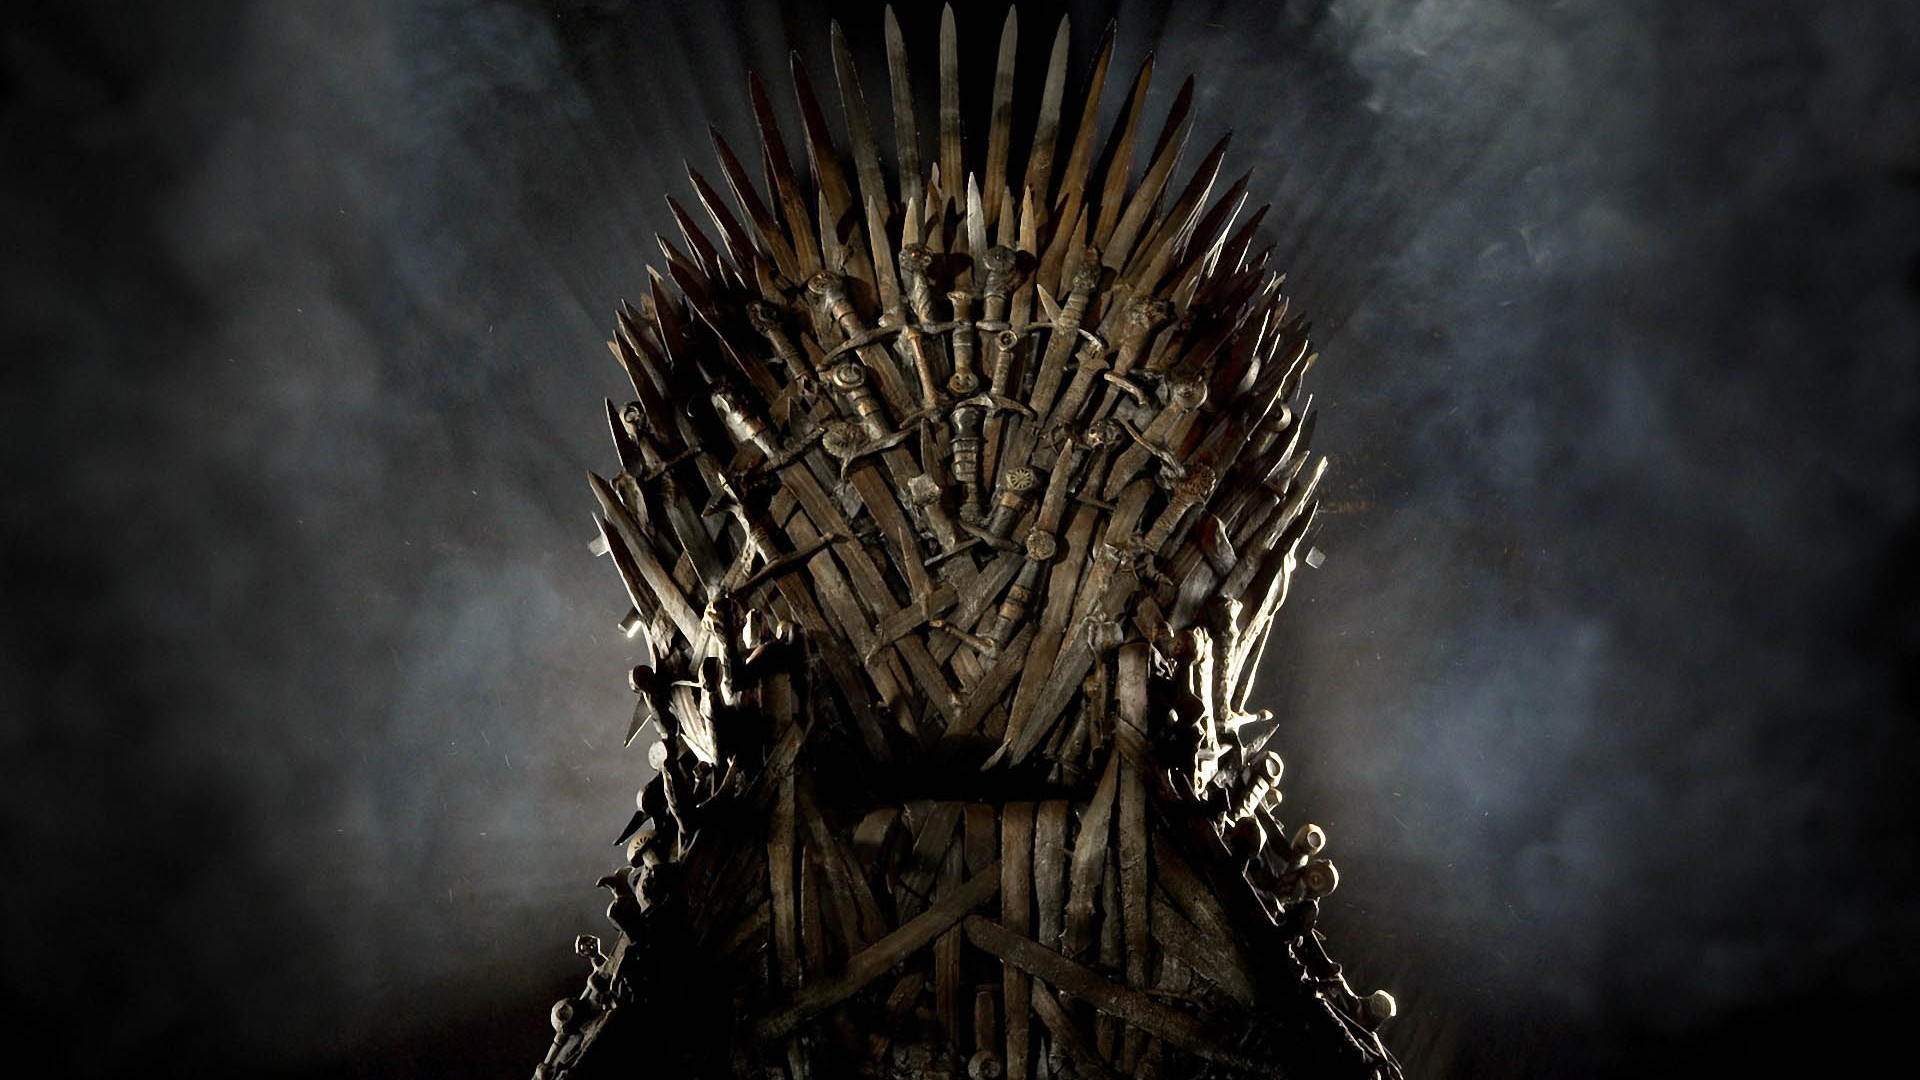 1920x1080 Game Of Thrones Iron Throne Wallpaper